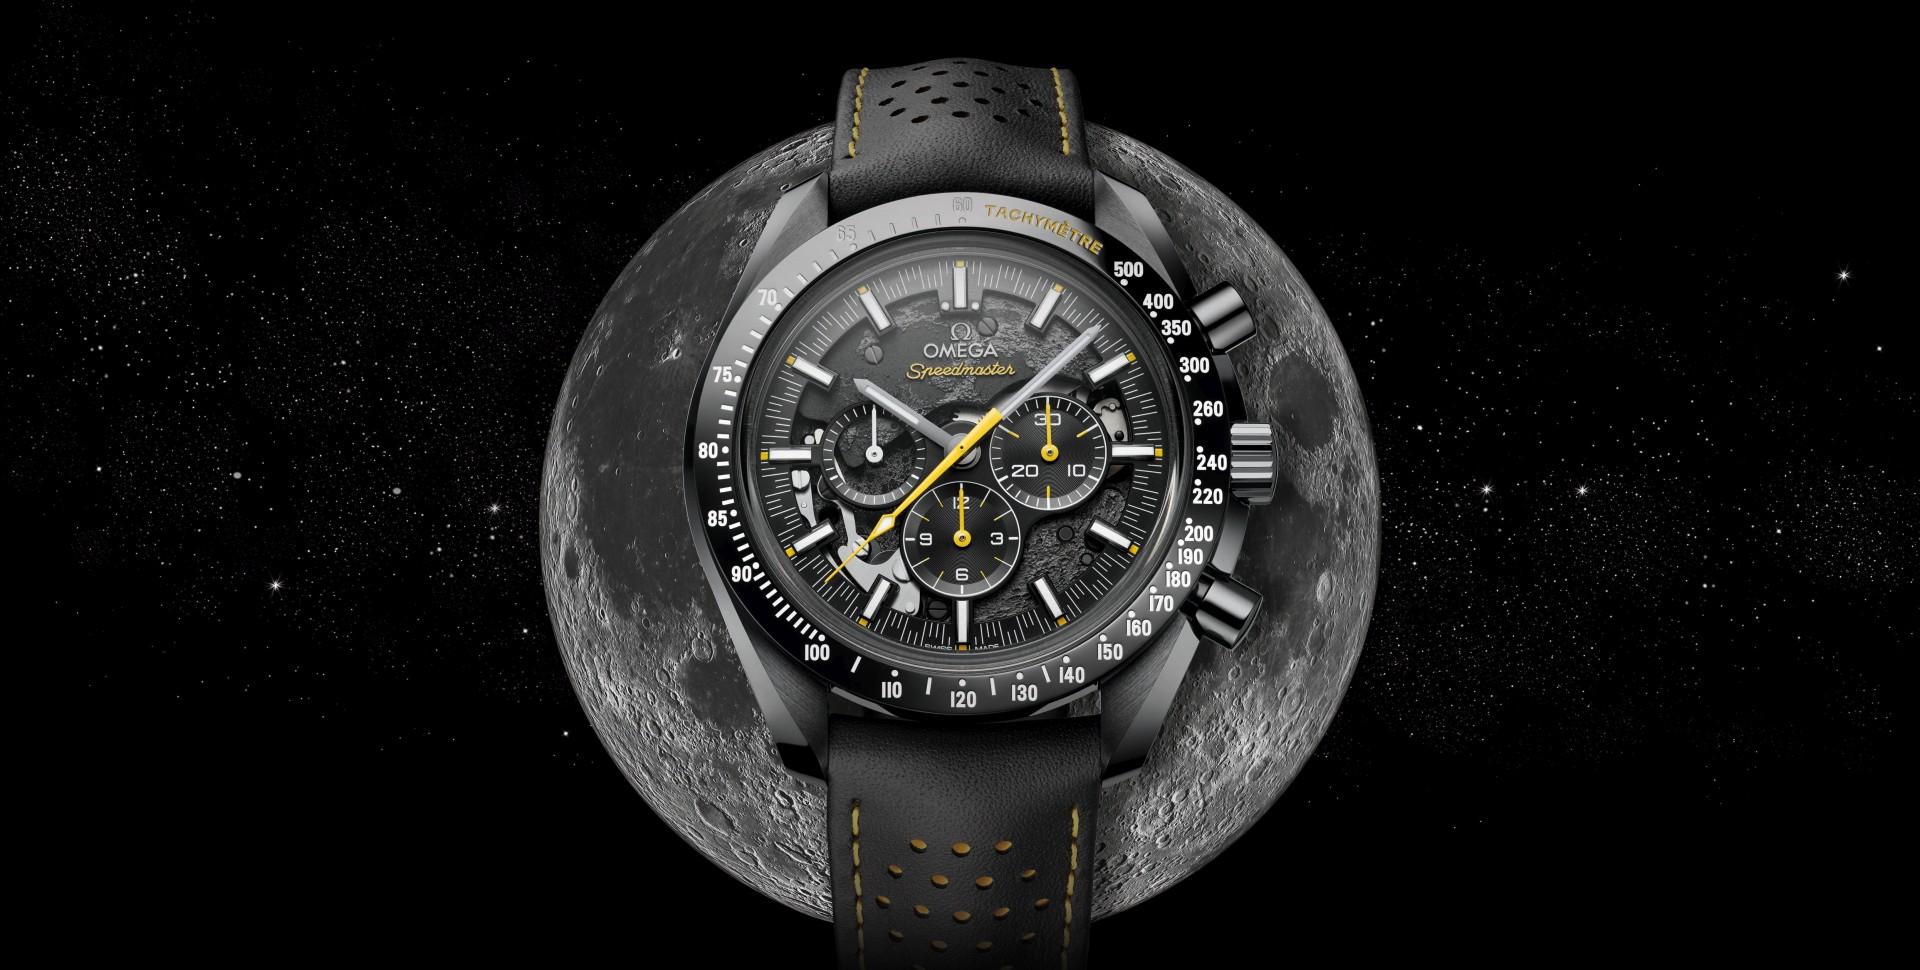 【Baselworld 2018錶展報導】五分鐘完全掌握OMEGA全新錶款